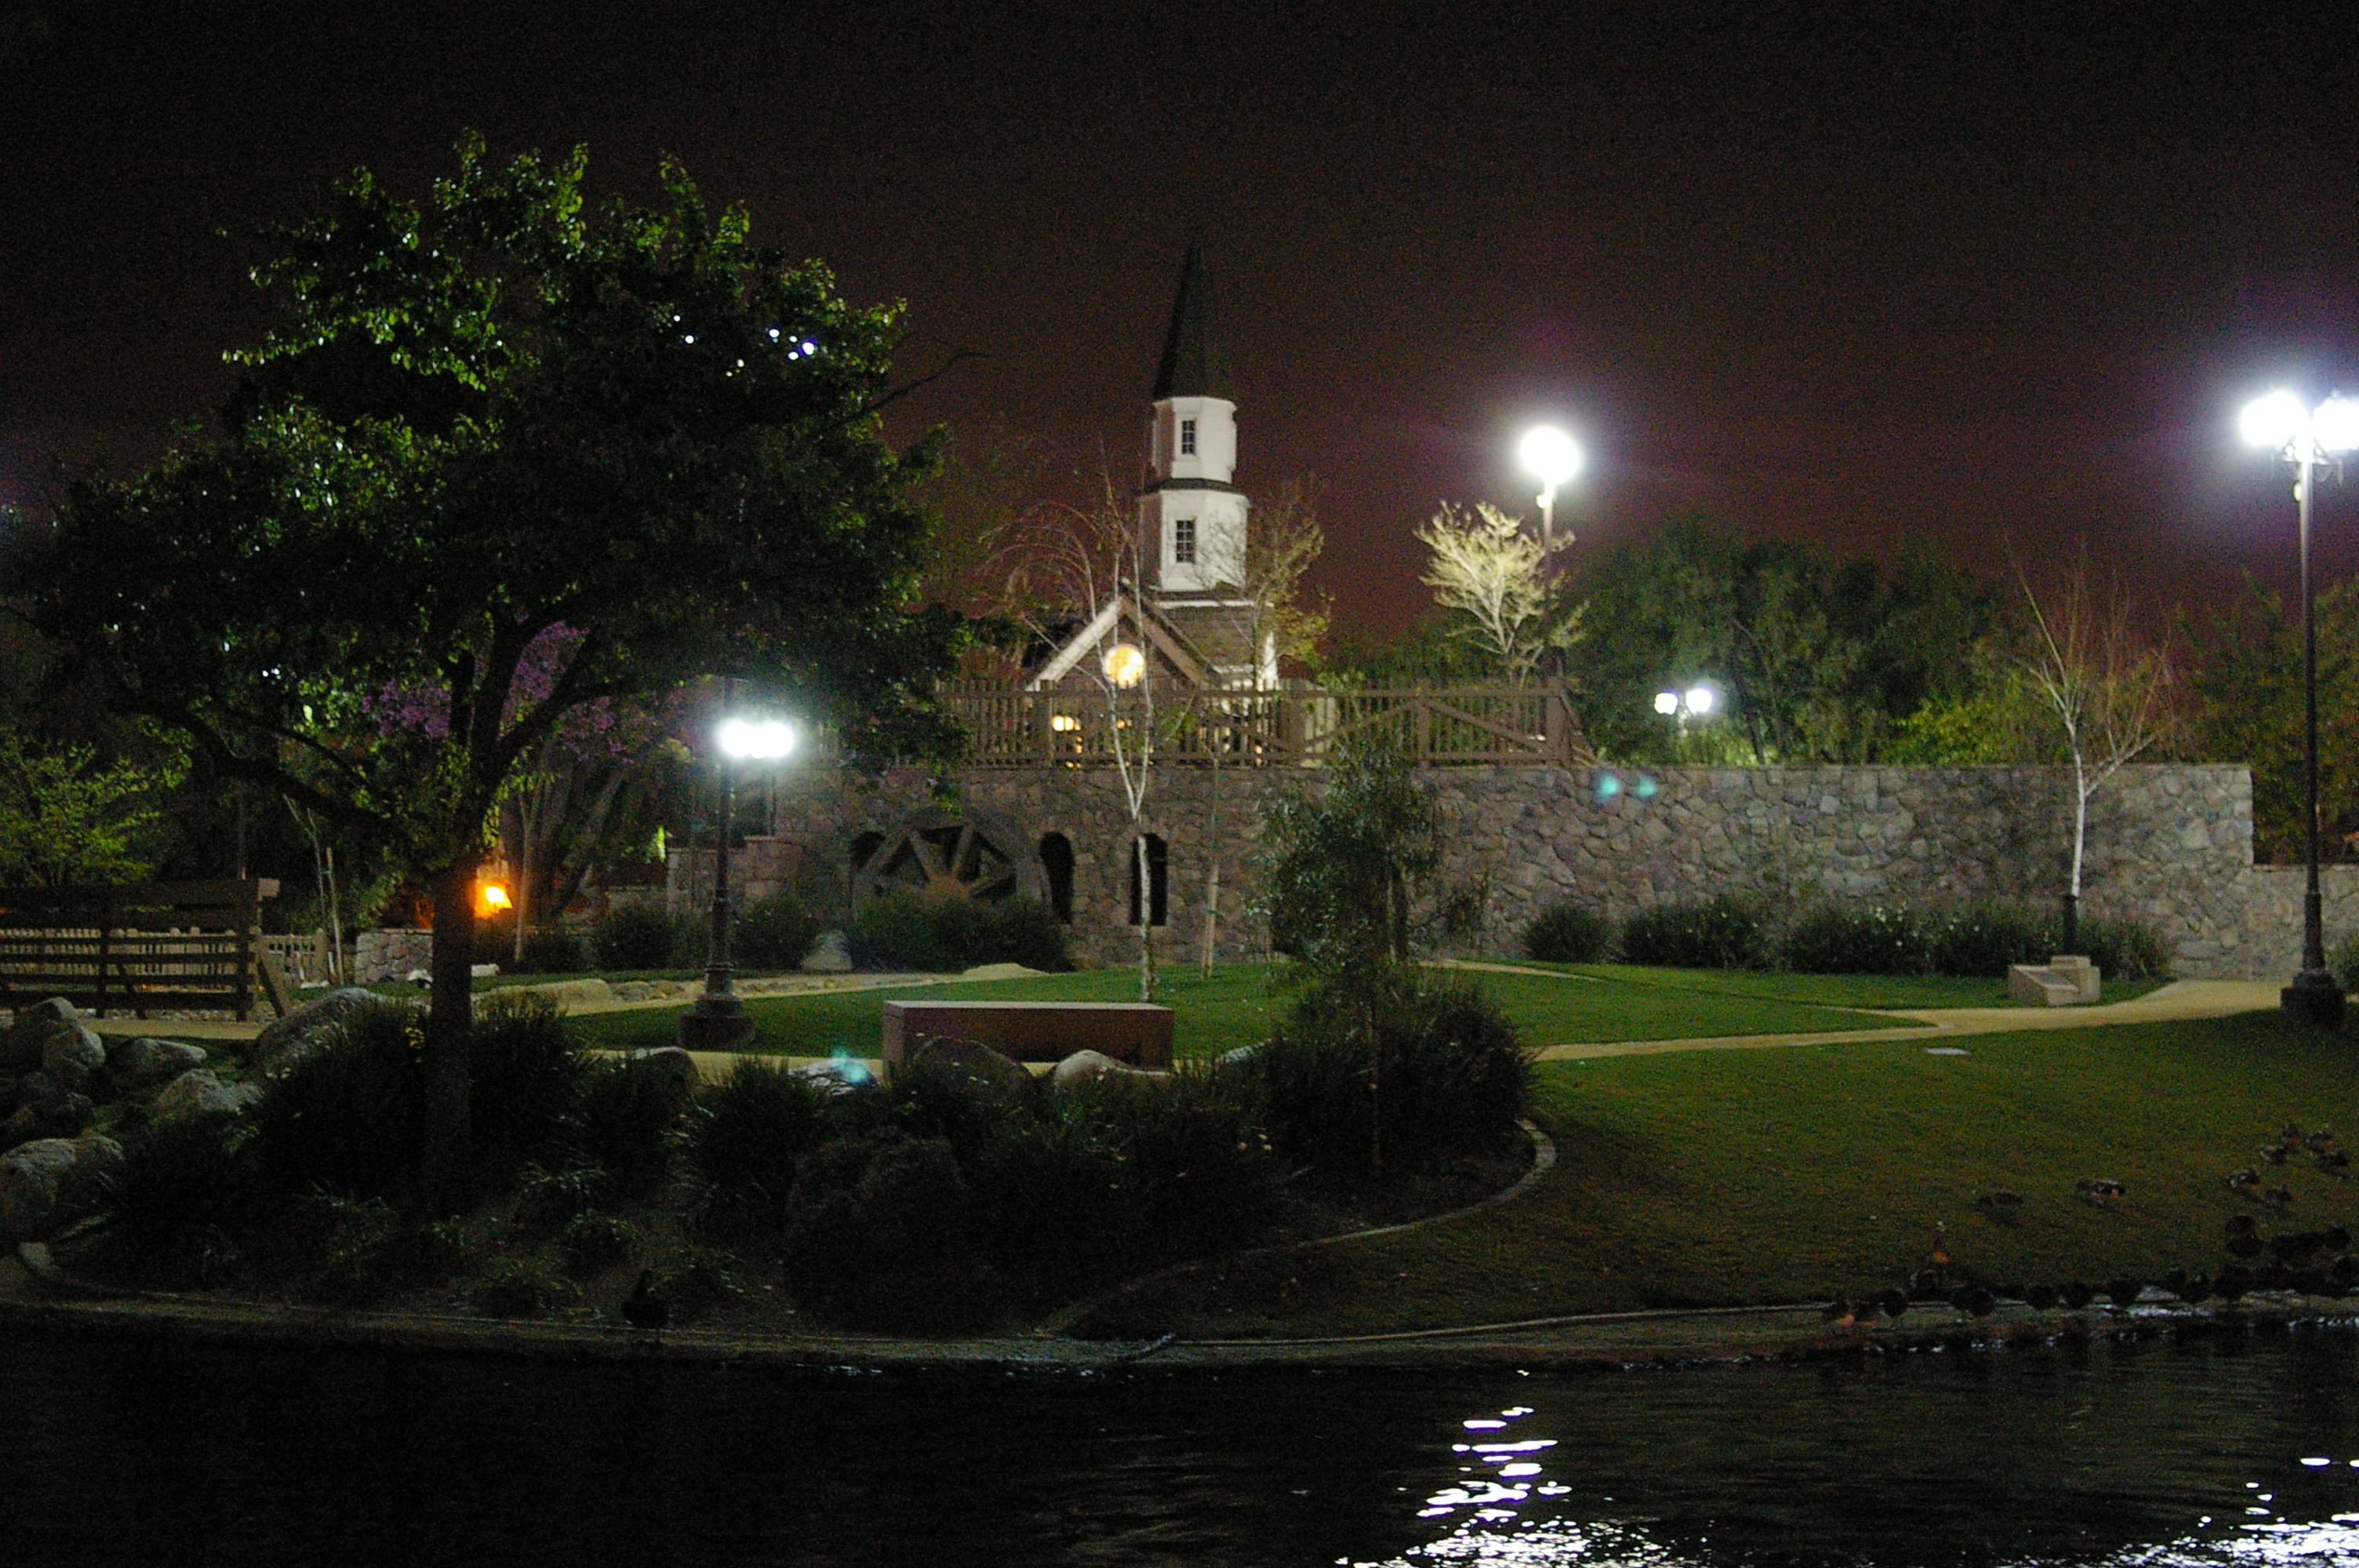 Cerritos Heritage Park Play Island